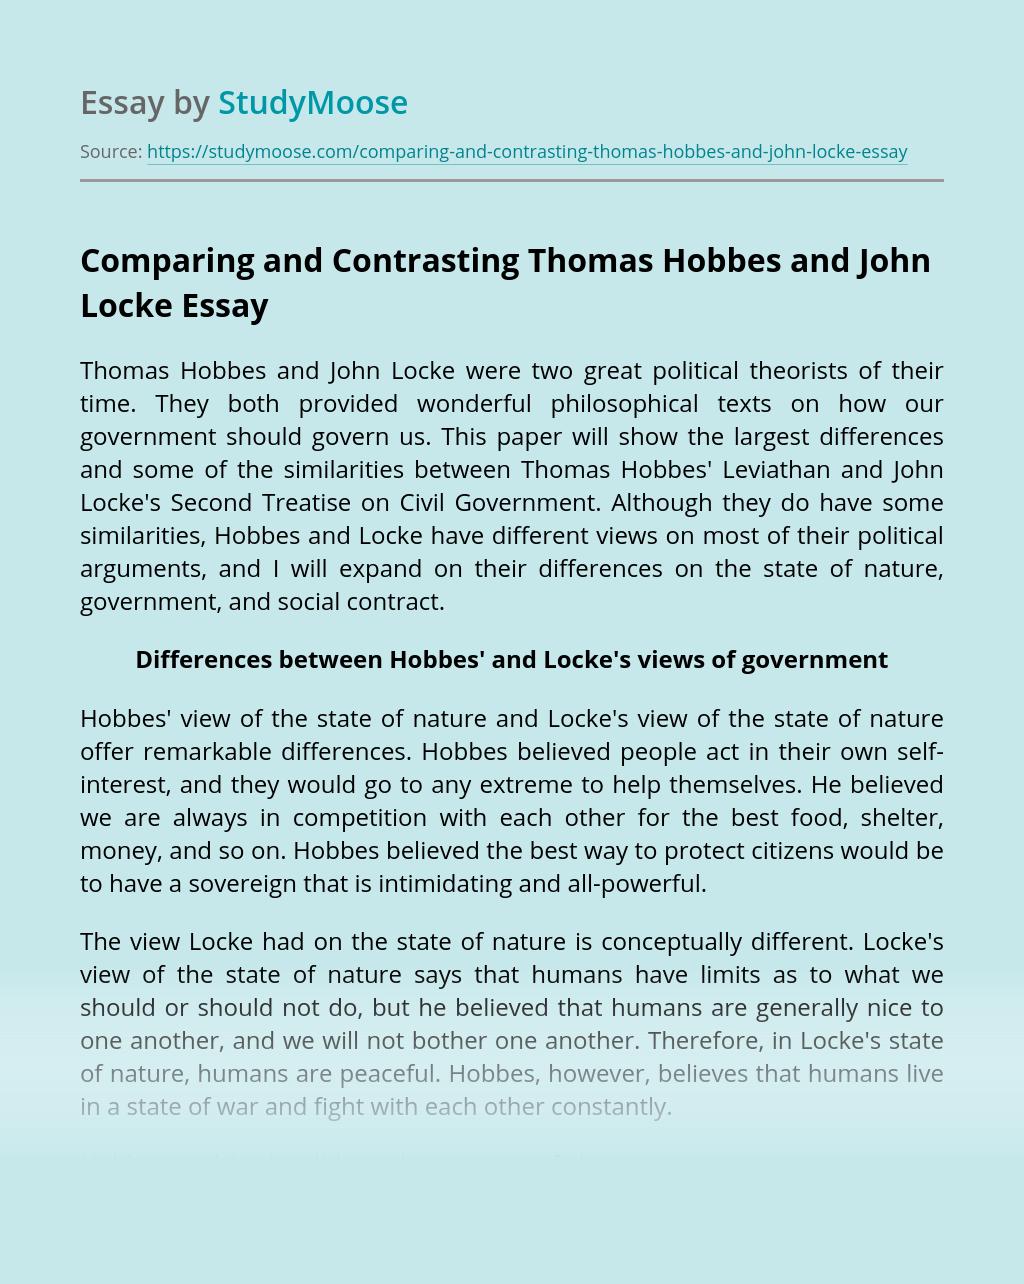 Comparing and Contrasting Thomas Hobbes and John Locke